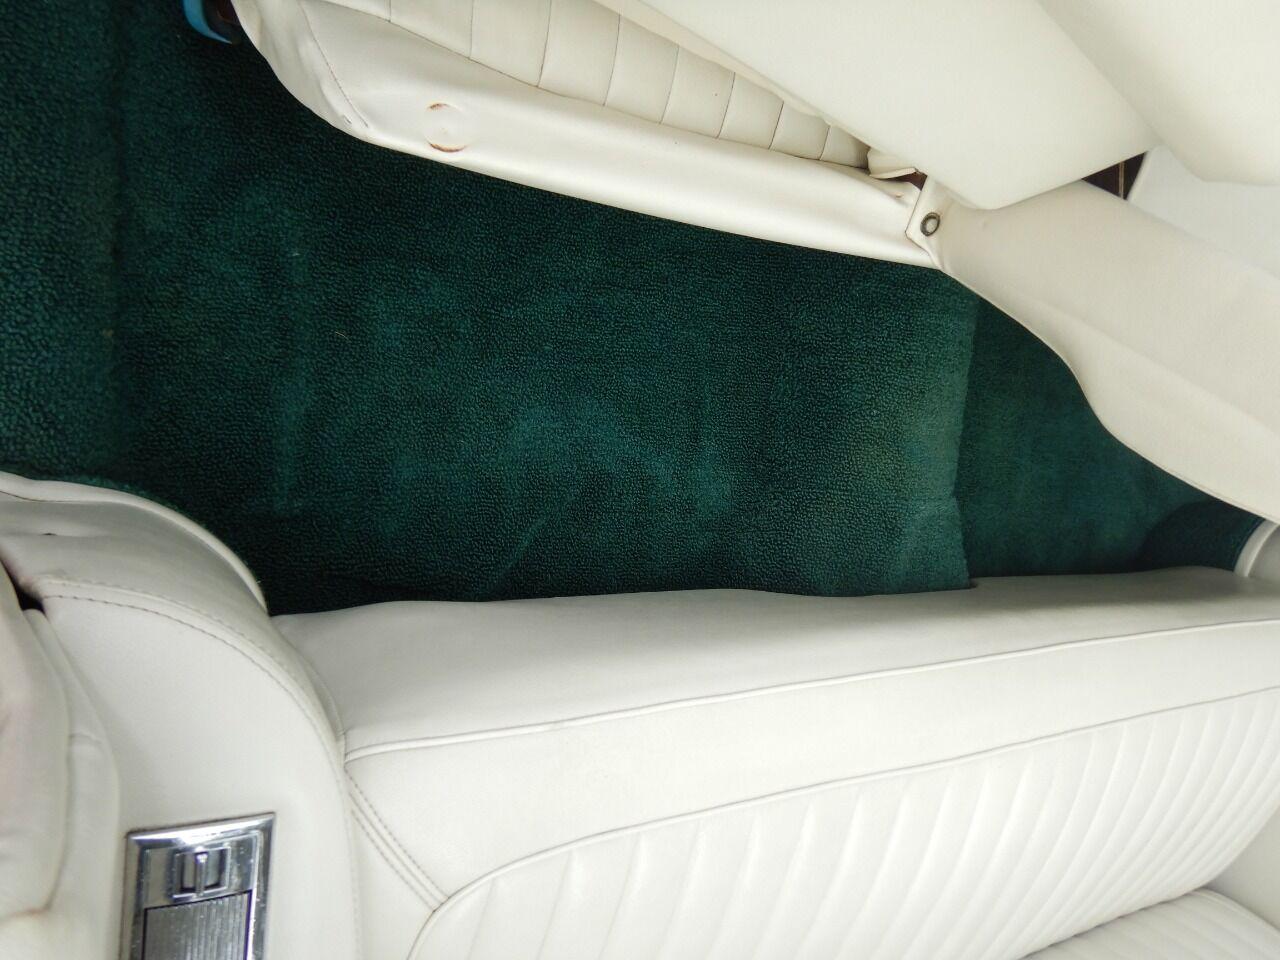 1961 Cadillac Eldorado Biarritz 61